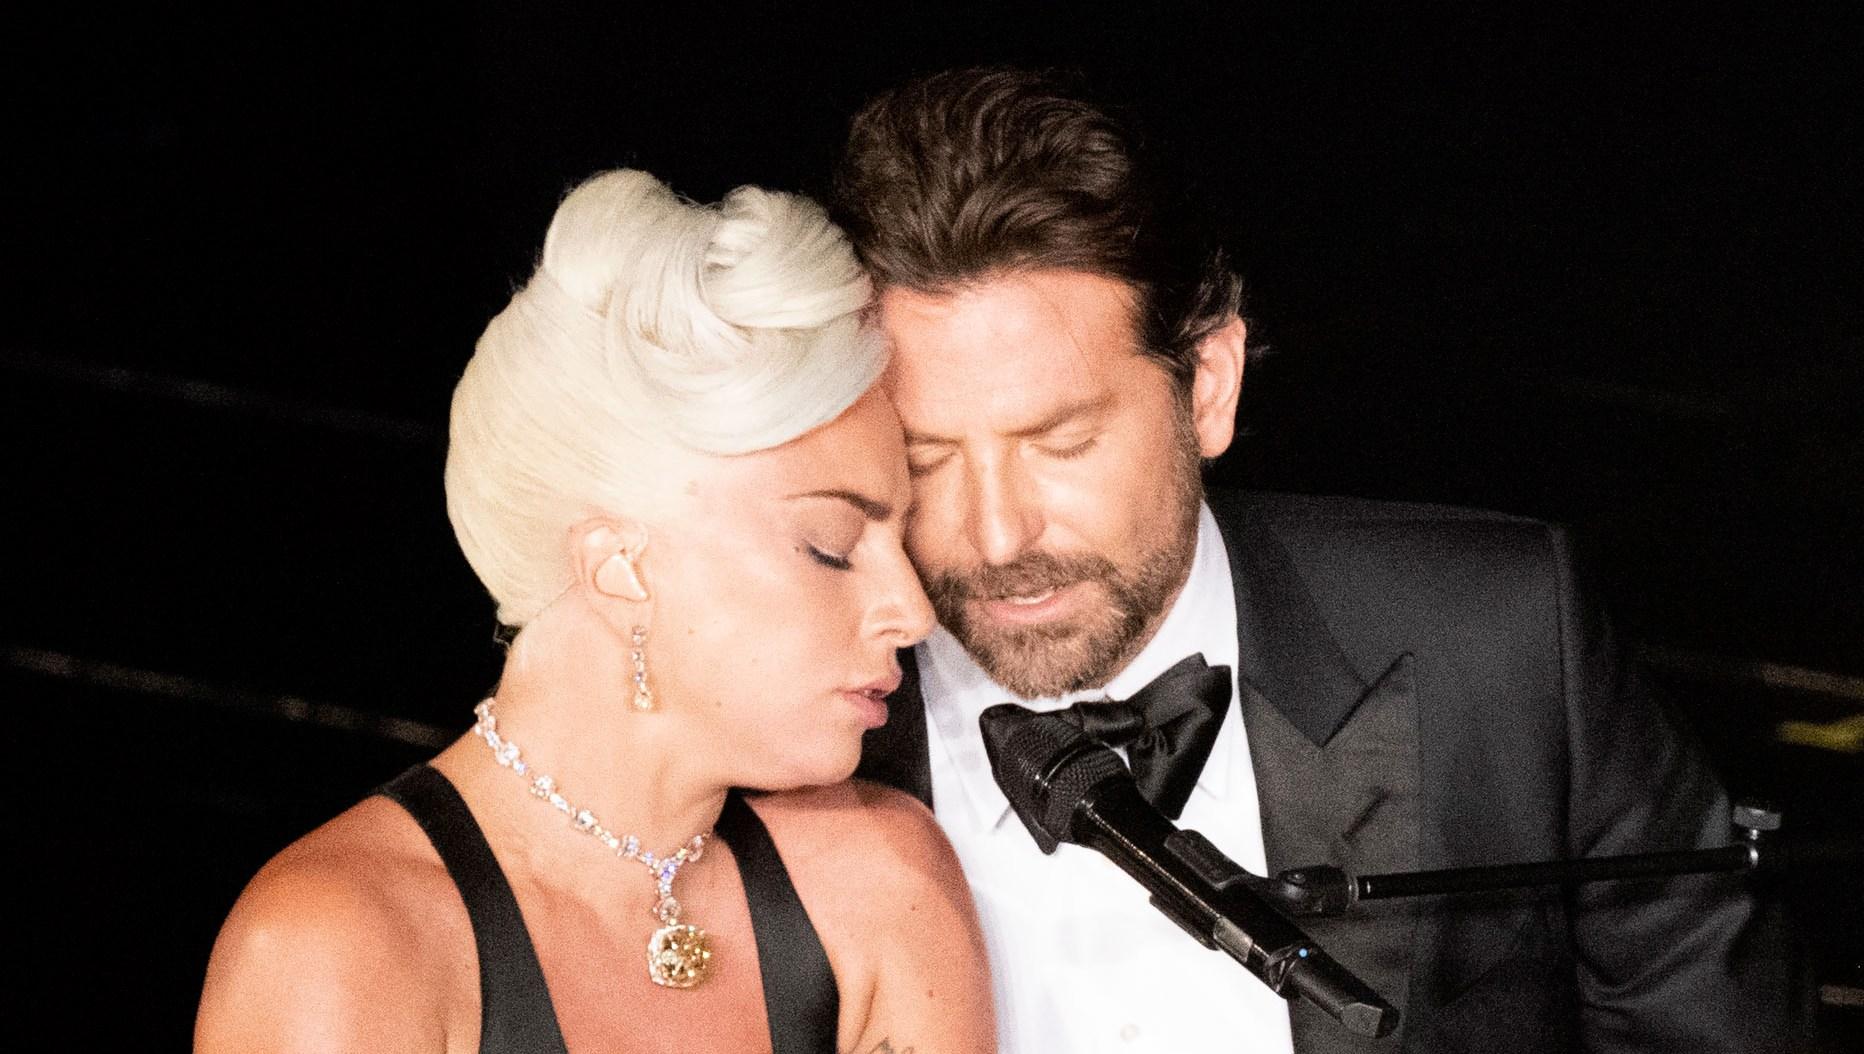 Lady-Gaga-and-Bradley-Cooper-shallow-oscars-2019